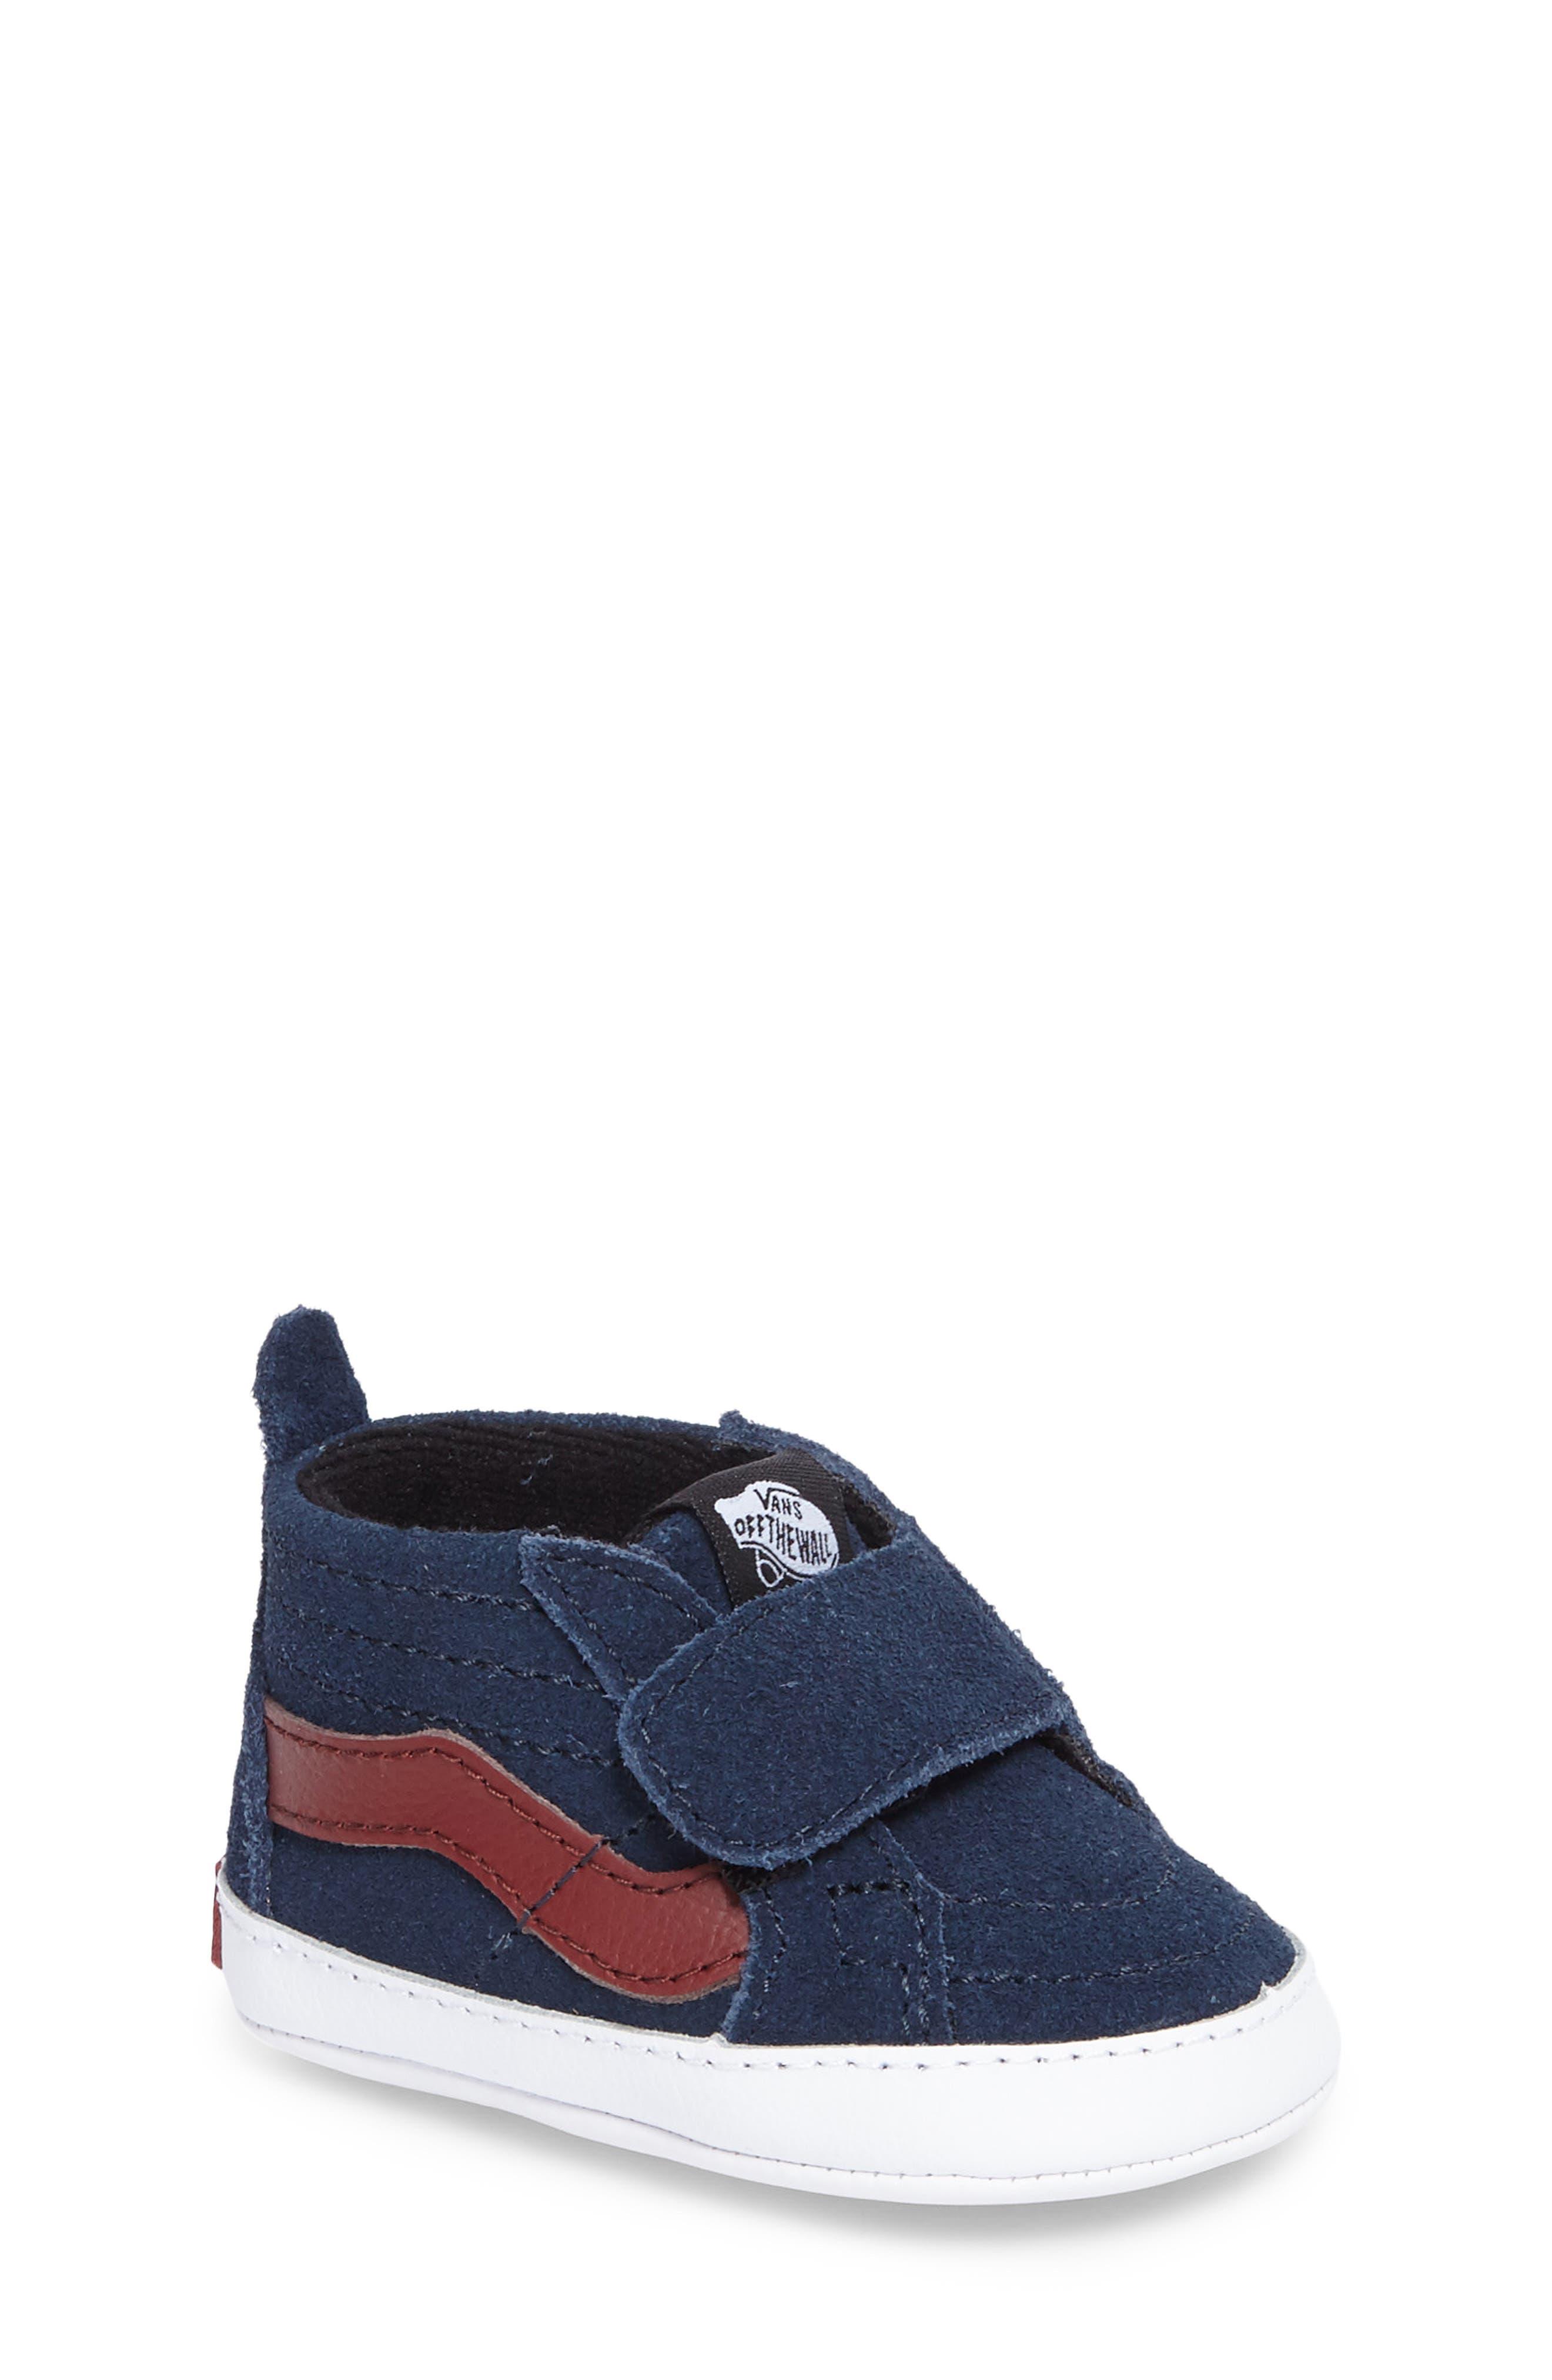 SK8-Hi Crib Sneaker,                             Main thumbnail 1, color,                             401